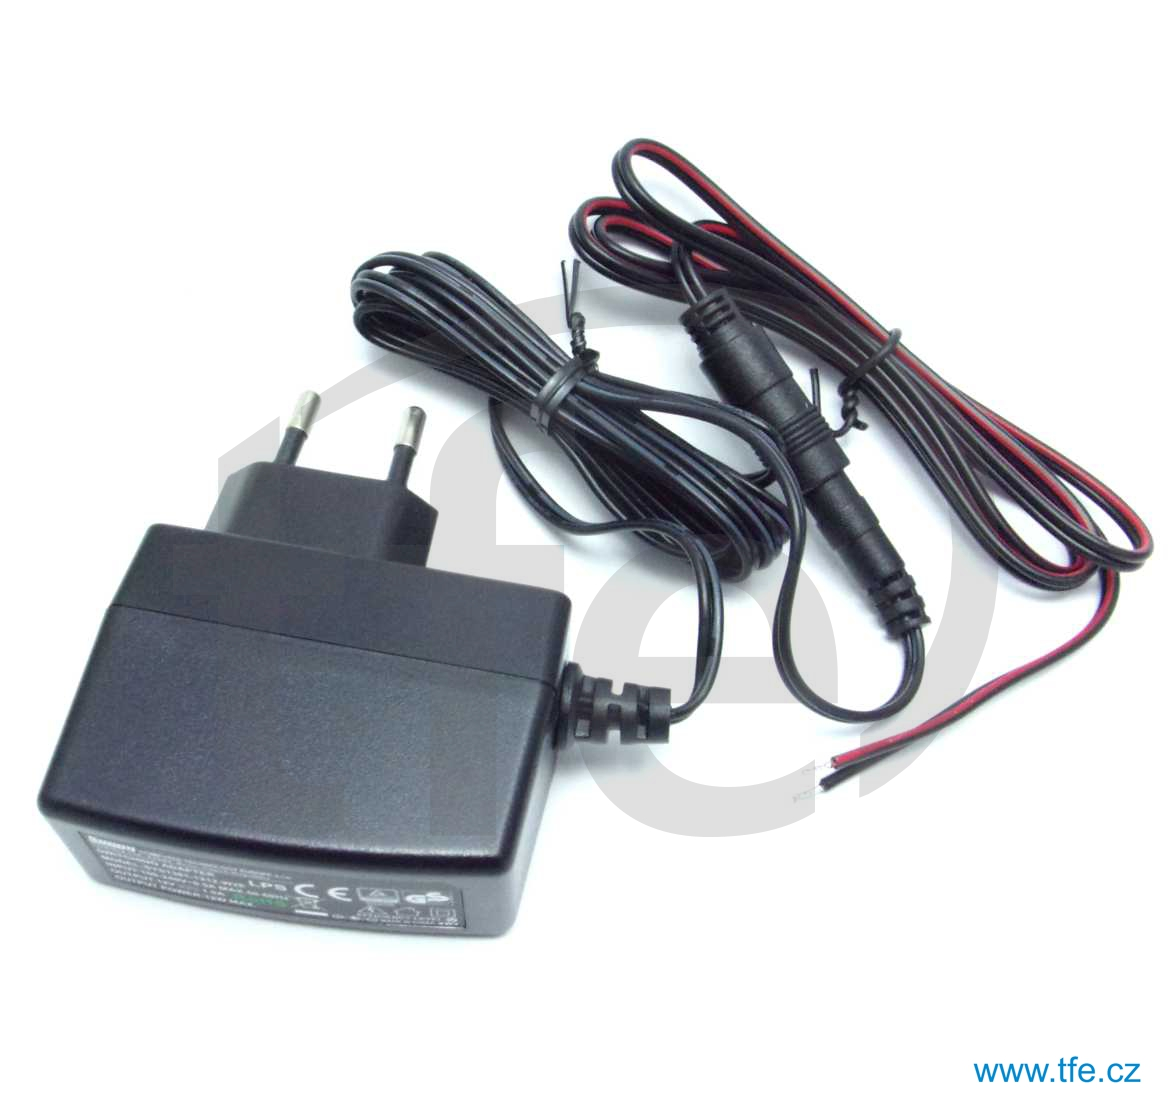 Nápajecí zdroj (adaptér) 12V / 1A NZ1212